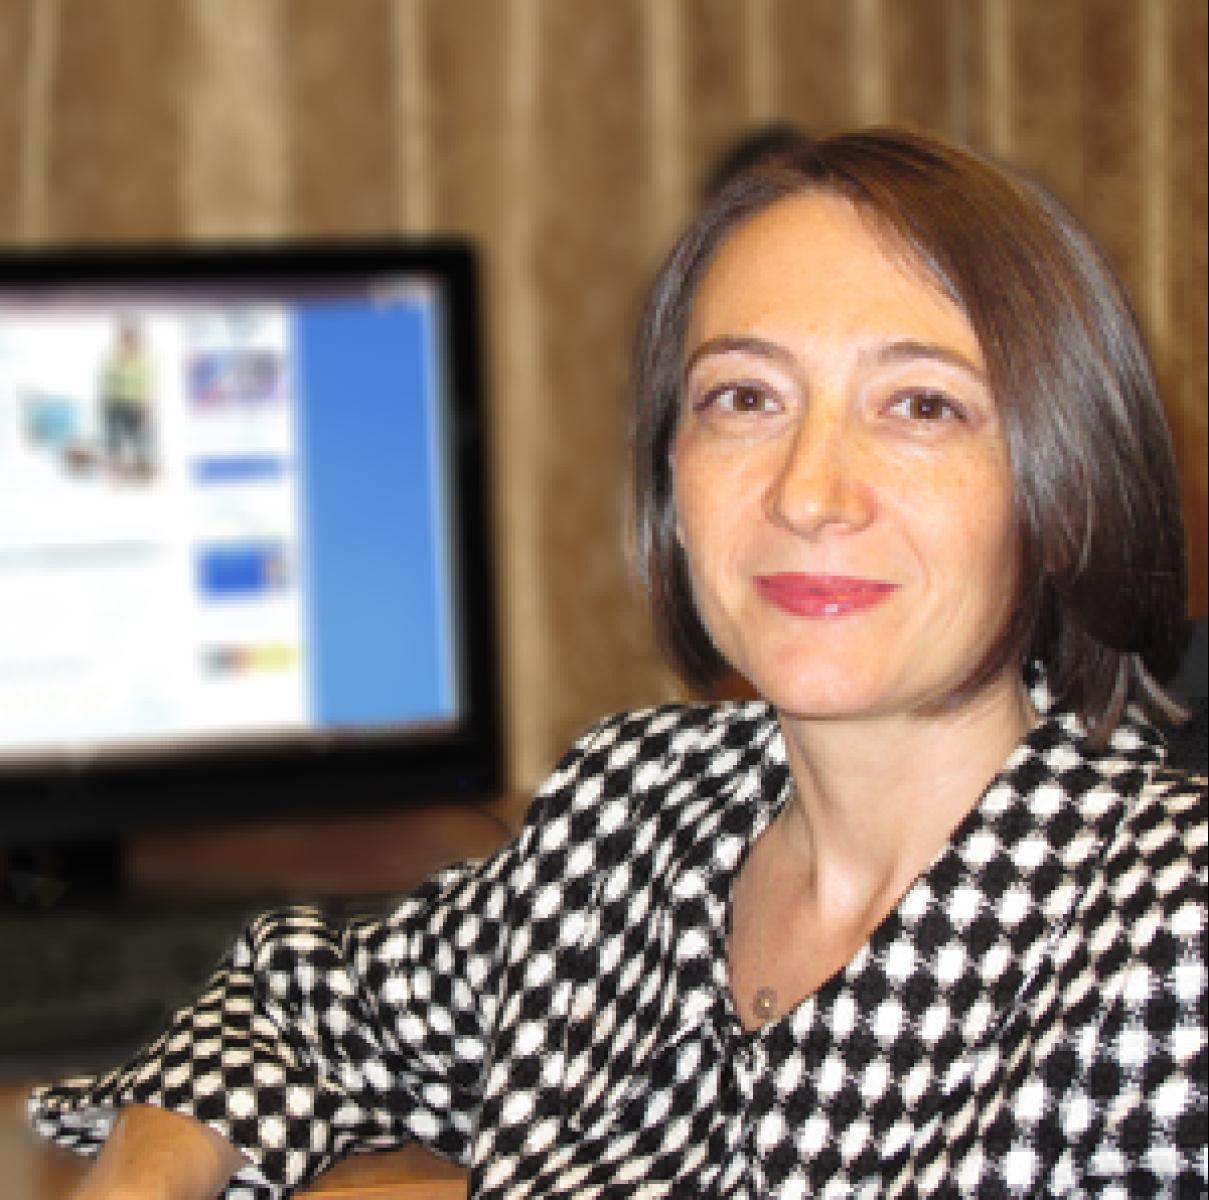 Dr Corina Mella